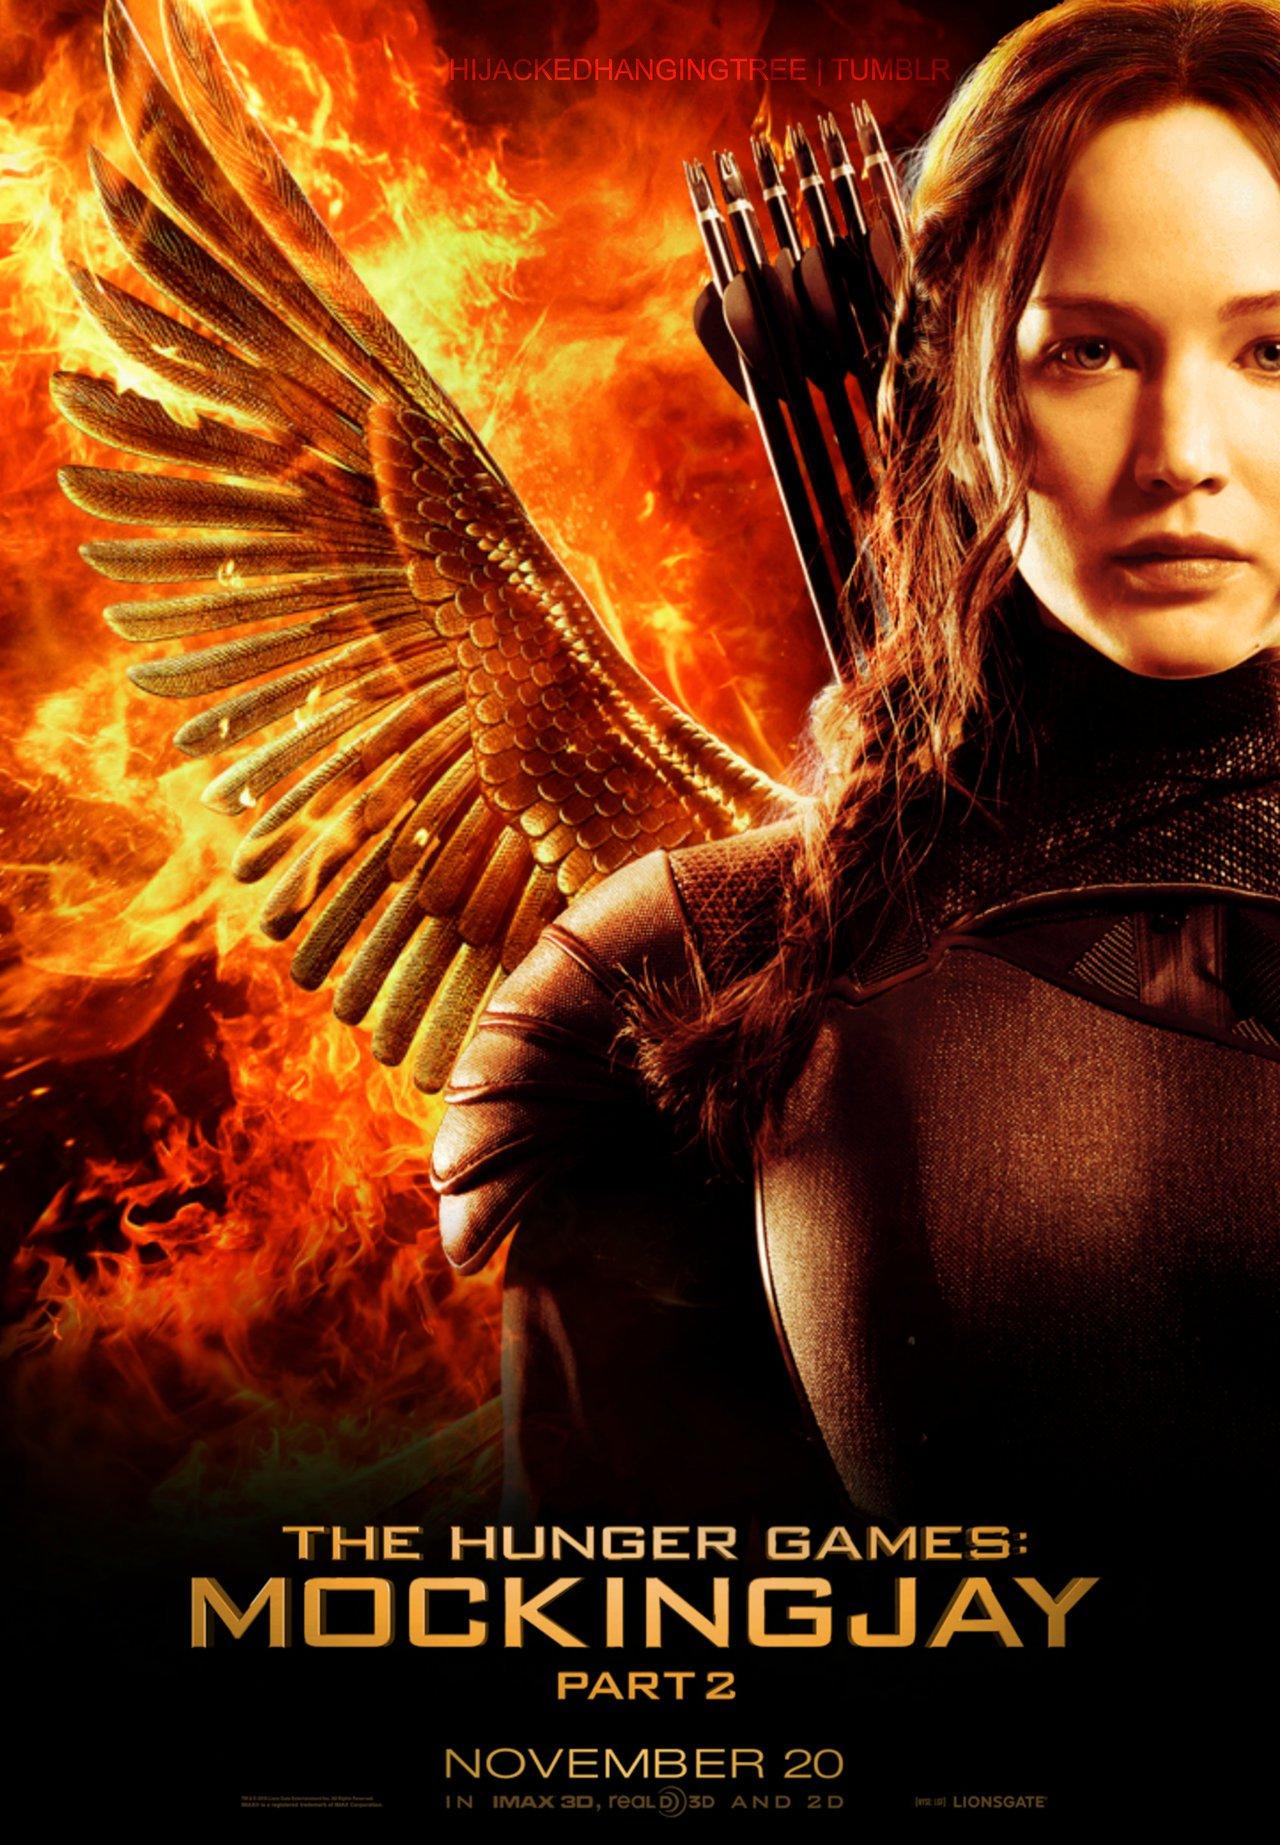 The Hunger Games: Mockingjay – Part 2 (2015) เกมล่าเกม 4: ม็อกกิ้งเจย์ พาร์ท 2